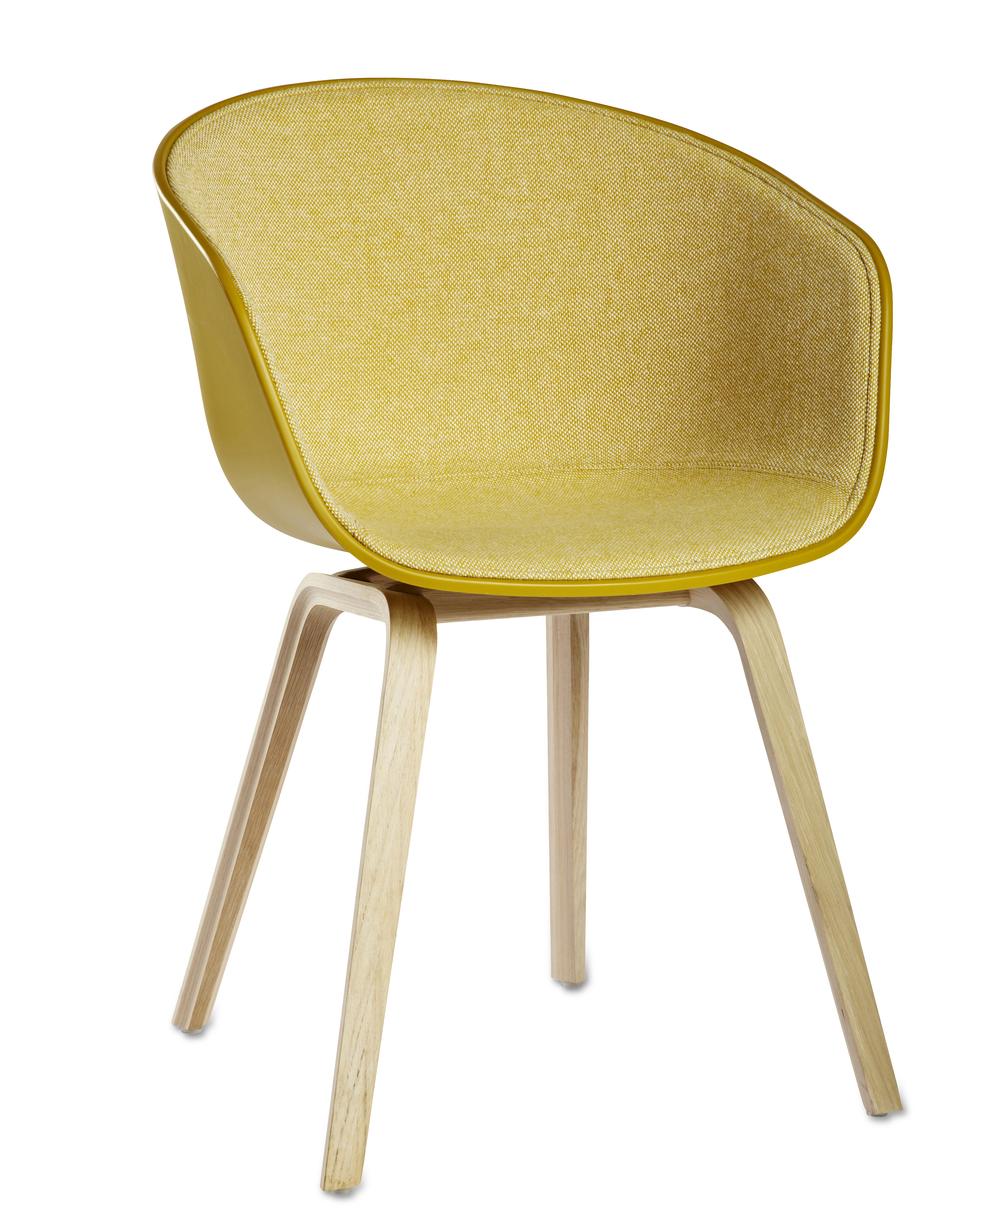 AAC22 Oak Soaped Base mustard w. front uph hallingdal 407 HAY About a chair design stoel Loncin design meubel zetel Leuven Brussels mechelen antwerpen vlaams-branbant Limburg Hasselt Tongeren Genk Sint-Truiden Zoutleeuw.jpg